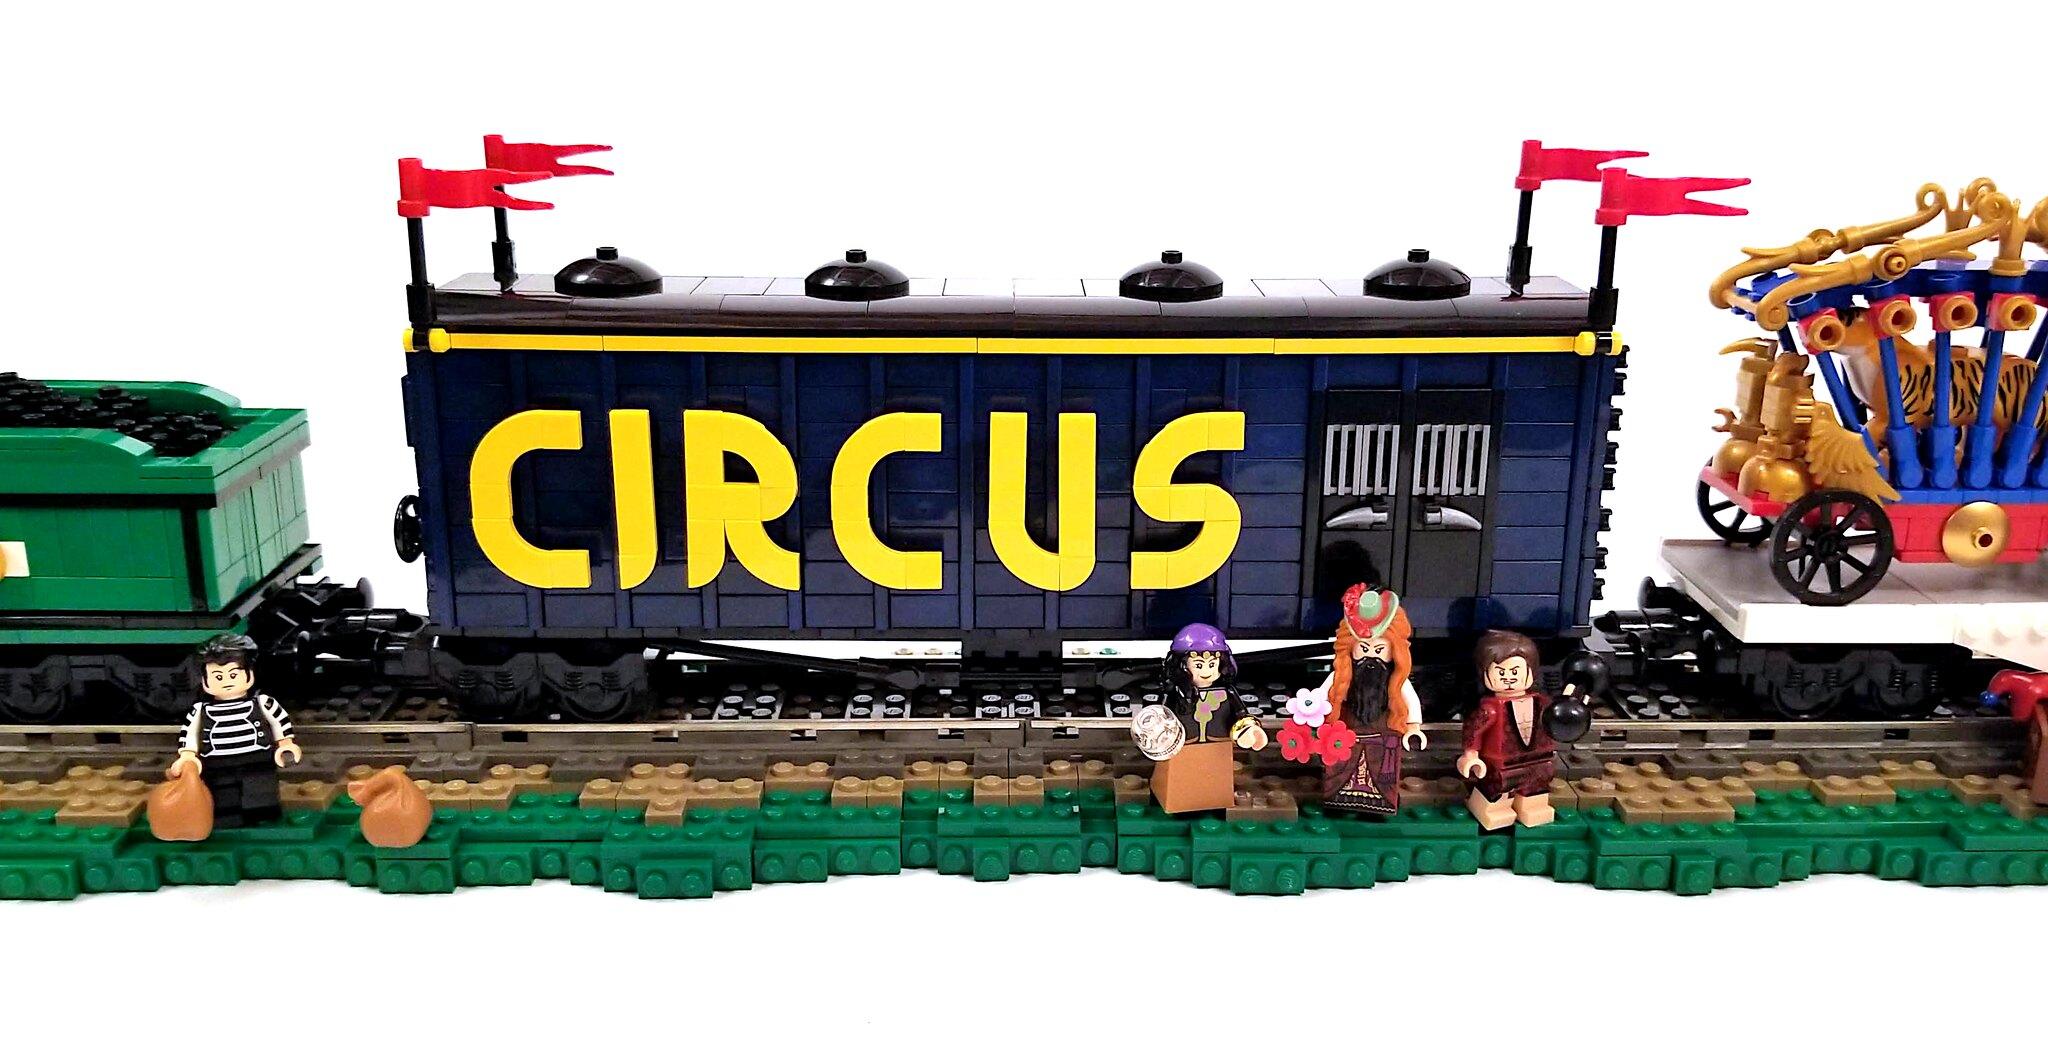 Porter Brothers Circus Train